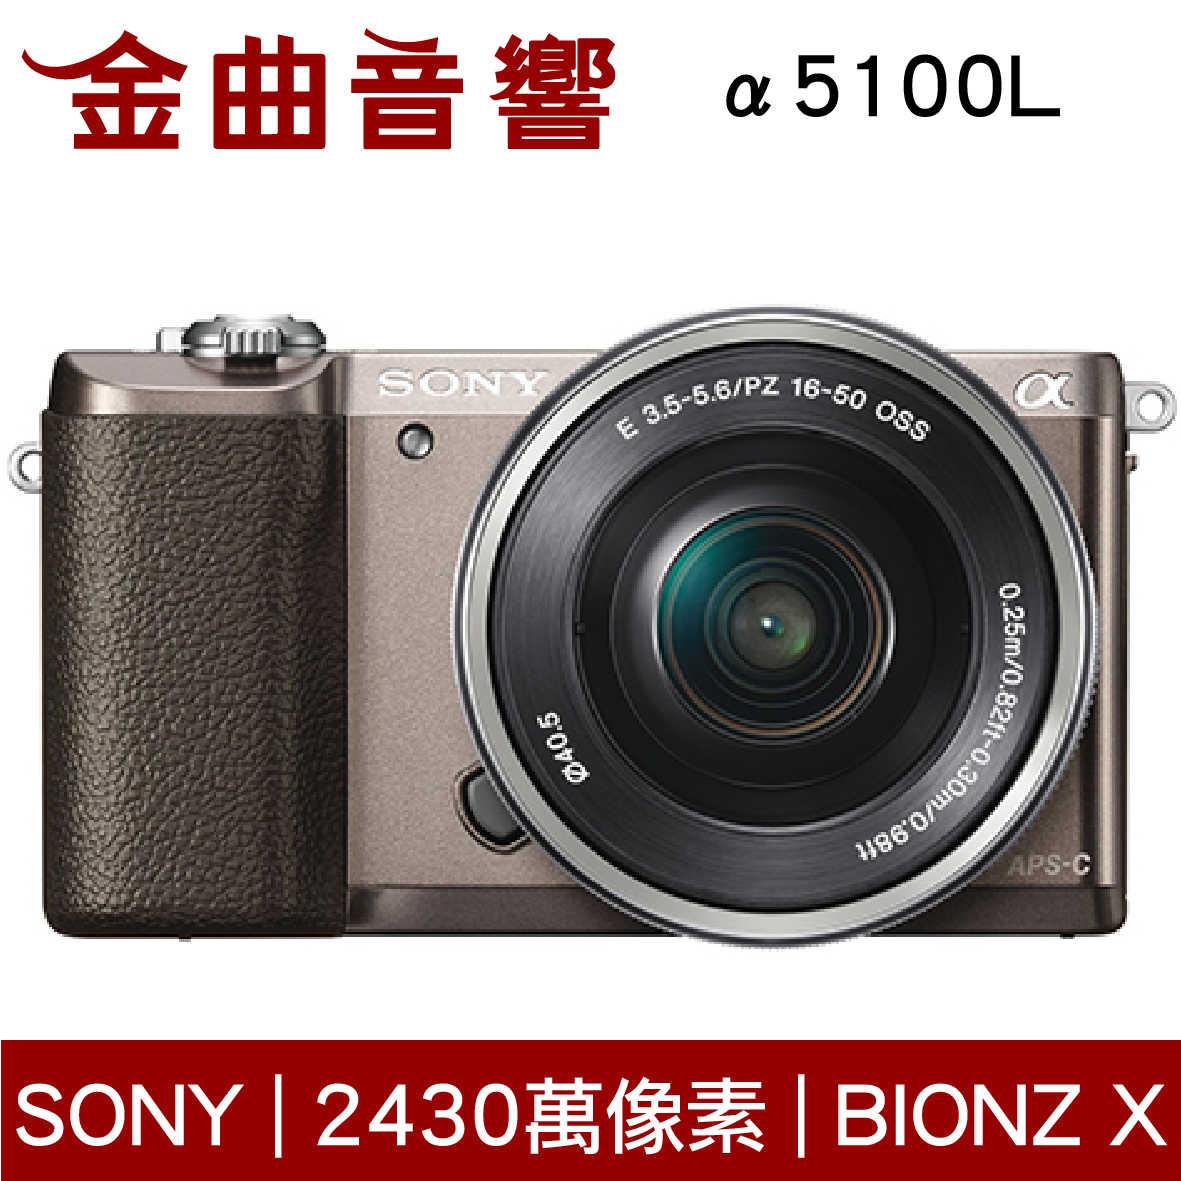 SONY 索尼 α5100L 棕色 變焦鏡組 ILCE-5100L 數位單眼相機 | 金曲音響